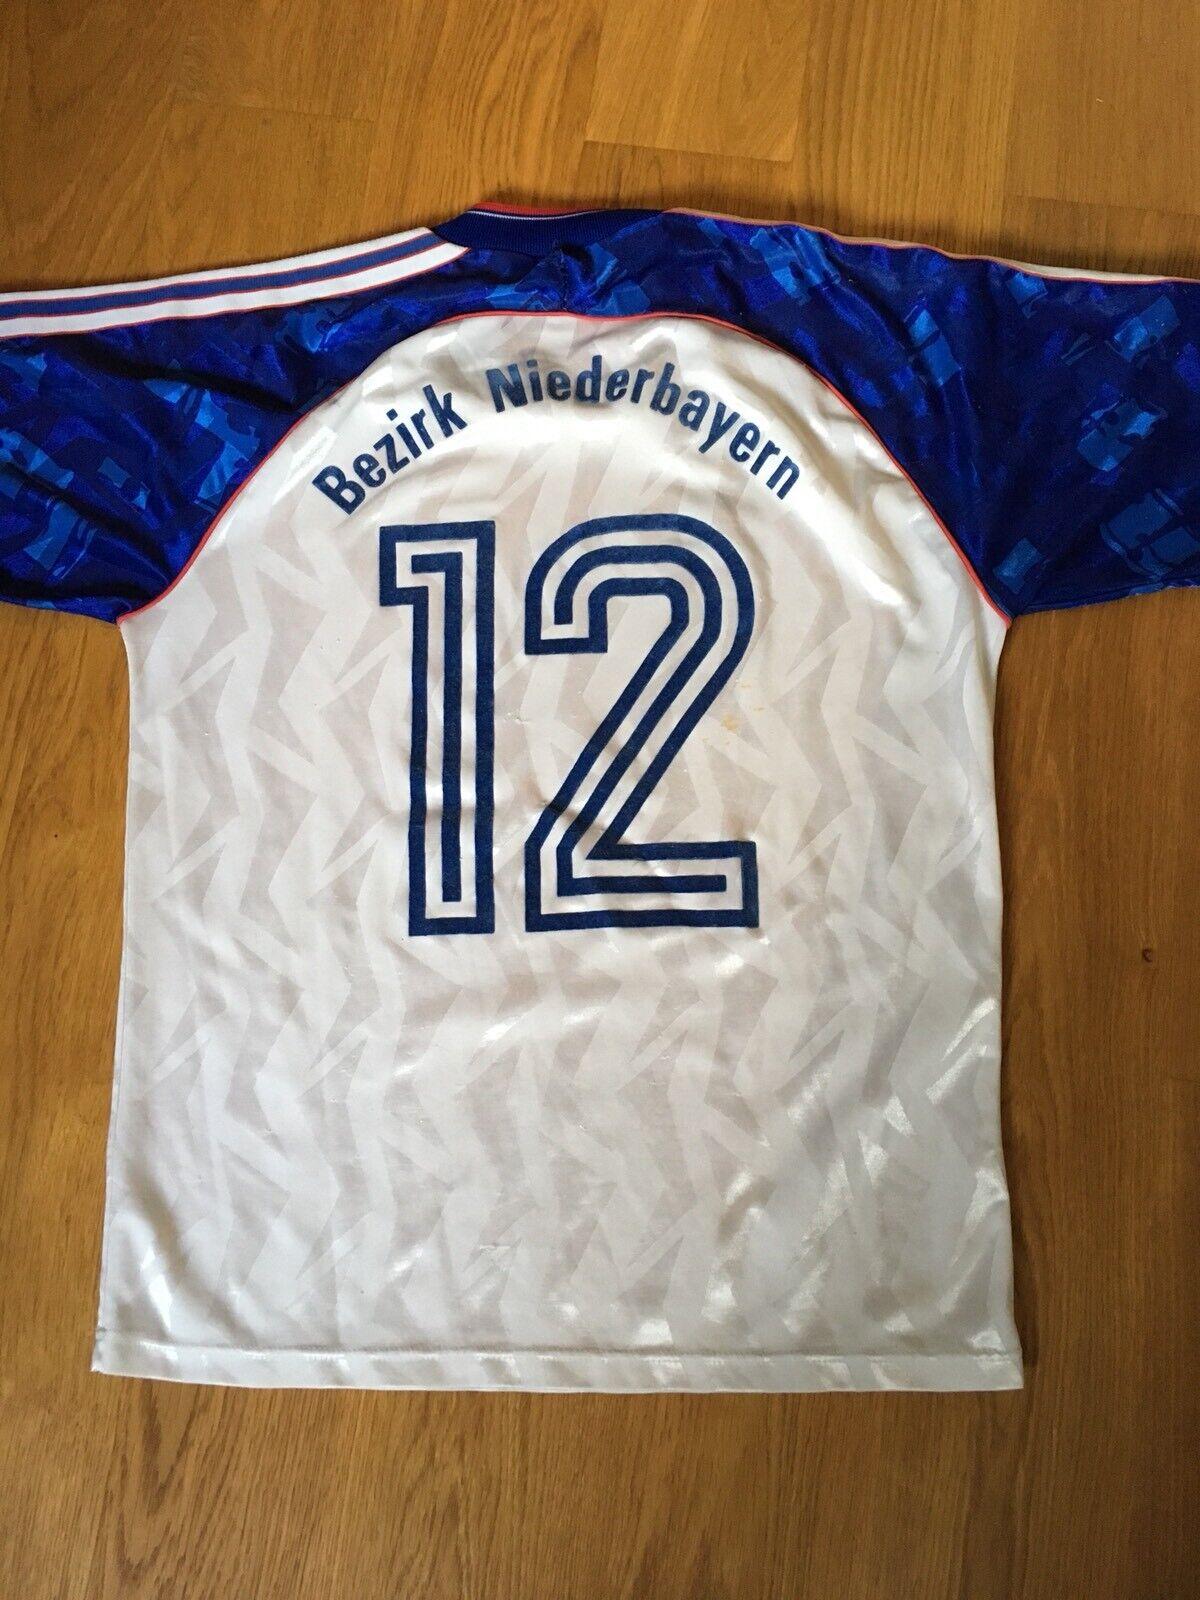 Bezirk Niederbayern maglia shirt jersey maillot worn issued match France Adidas